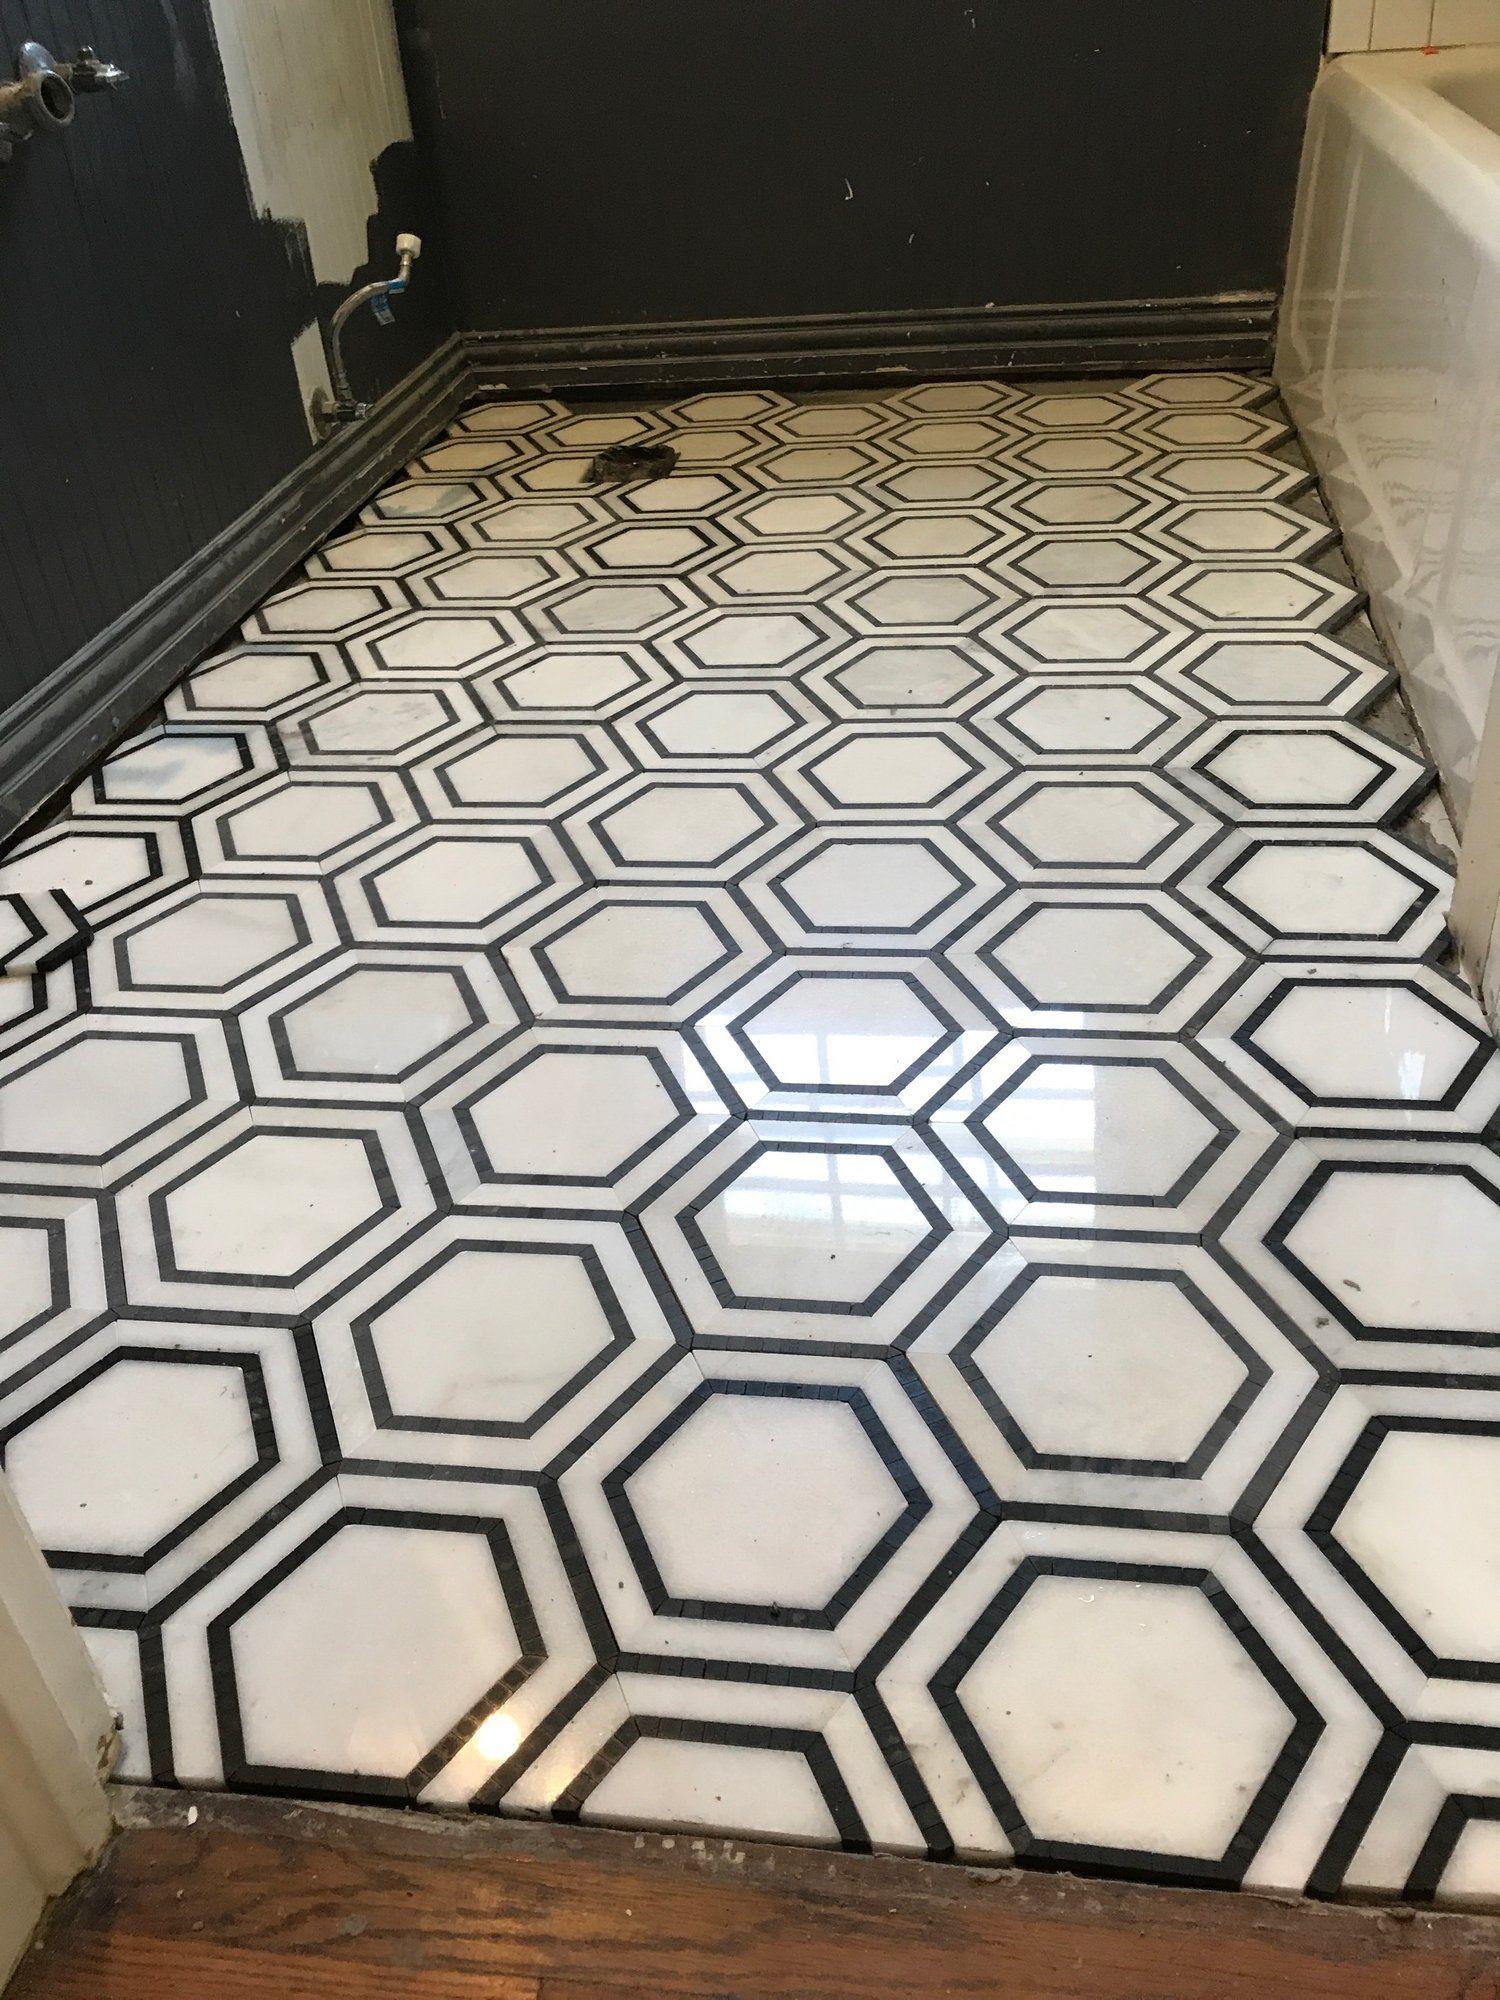 Hexagon Mosaic Bathroom Remodel Mosaic Bathroom Bathroom Design Inspiration Walk In Shower Designs